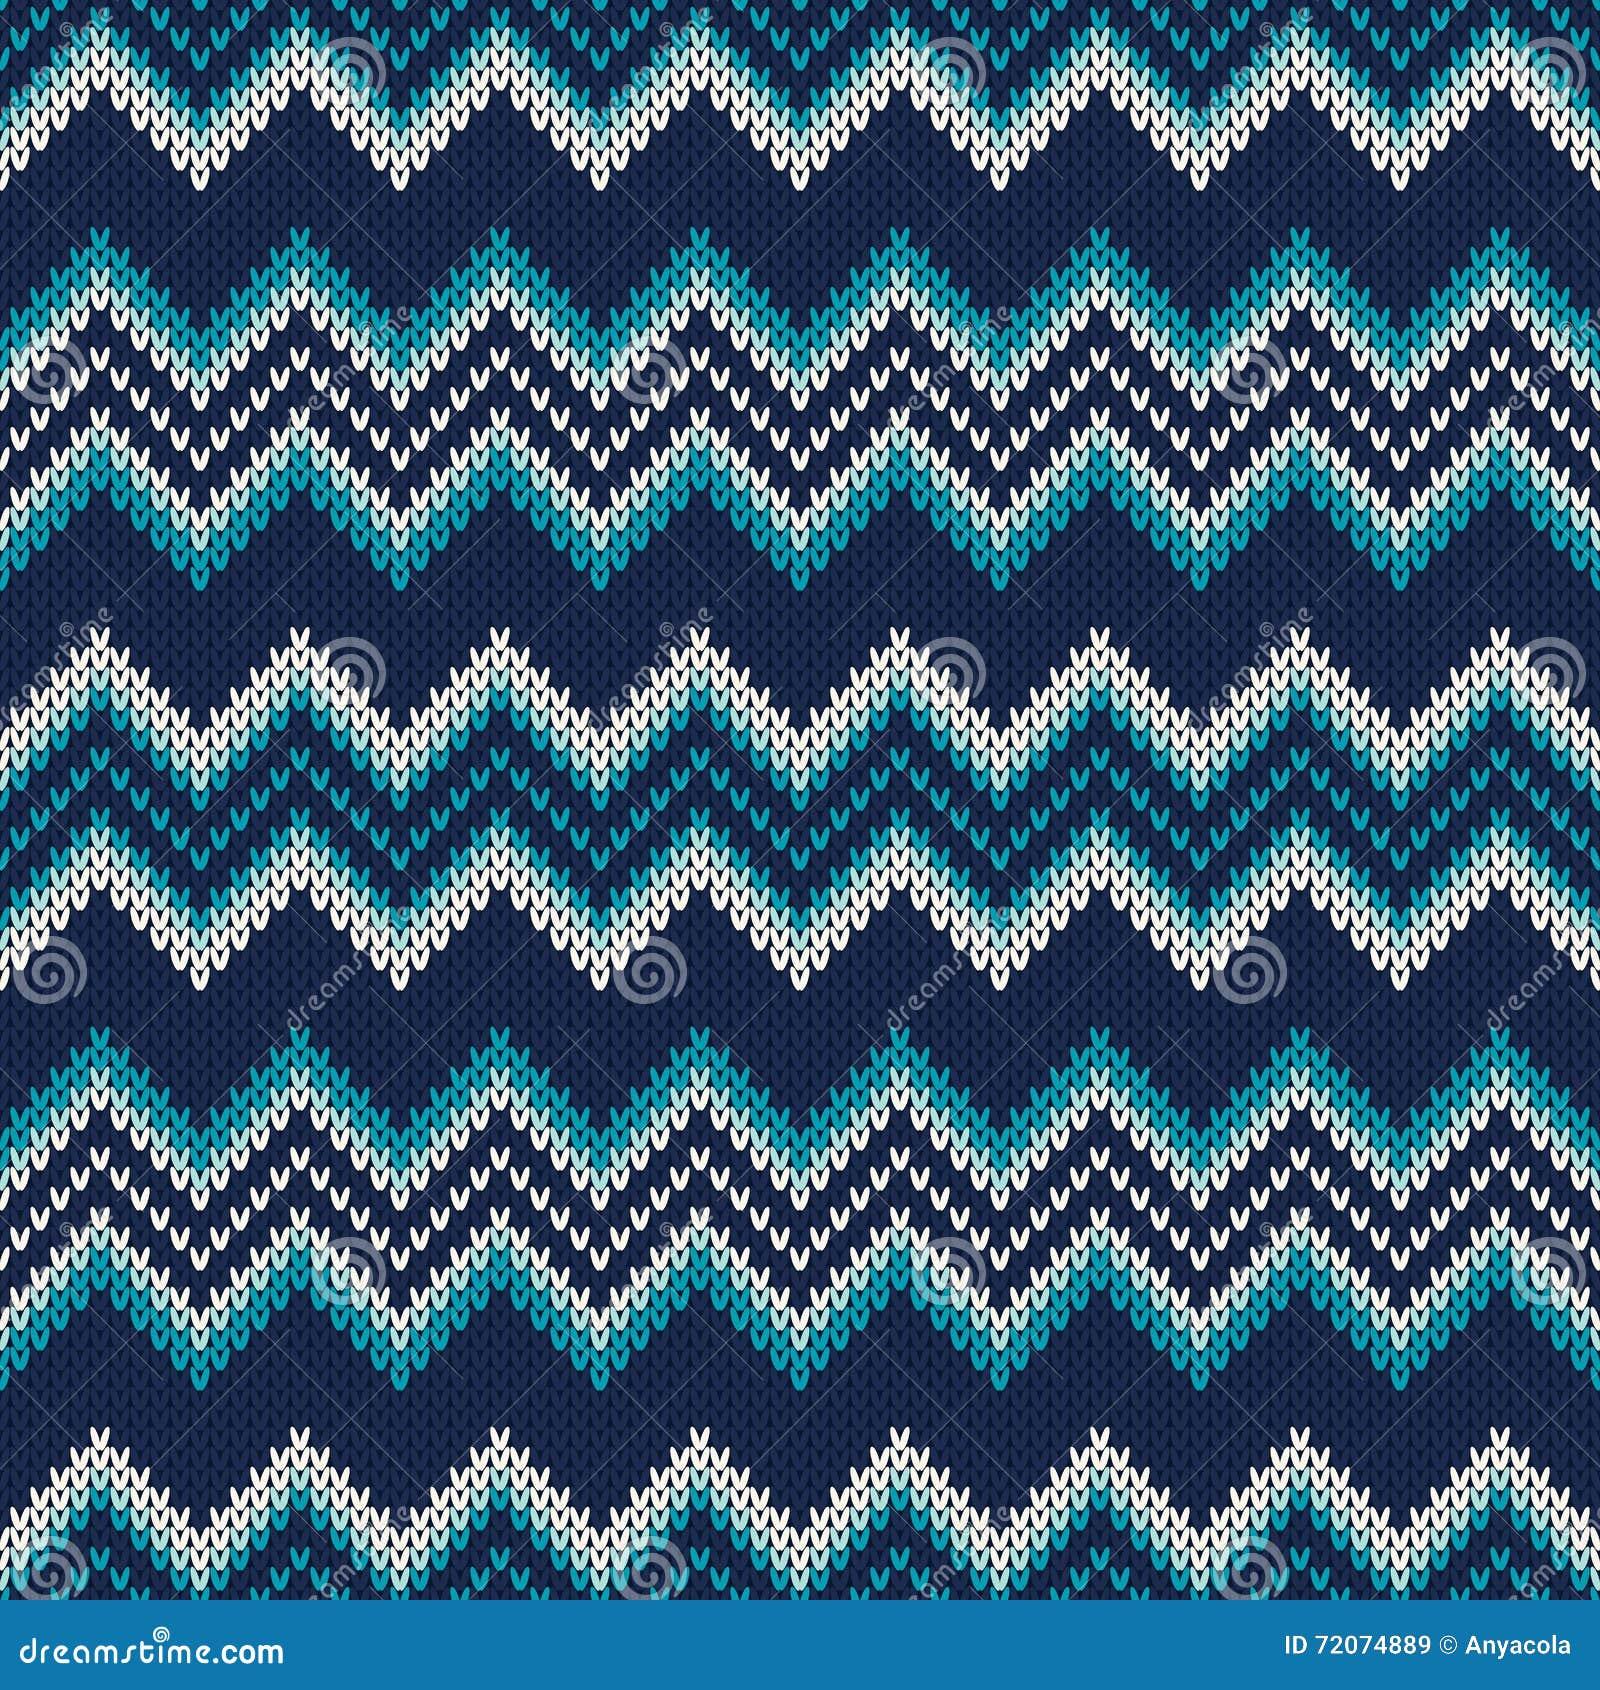 Chevron Knitted Pattern. Fair Isle Style Knitting Sweater Design ...